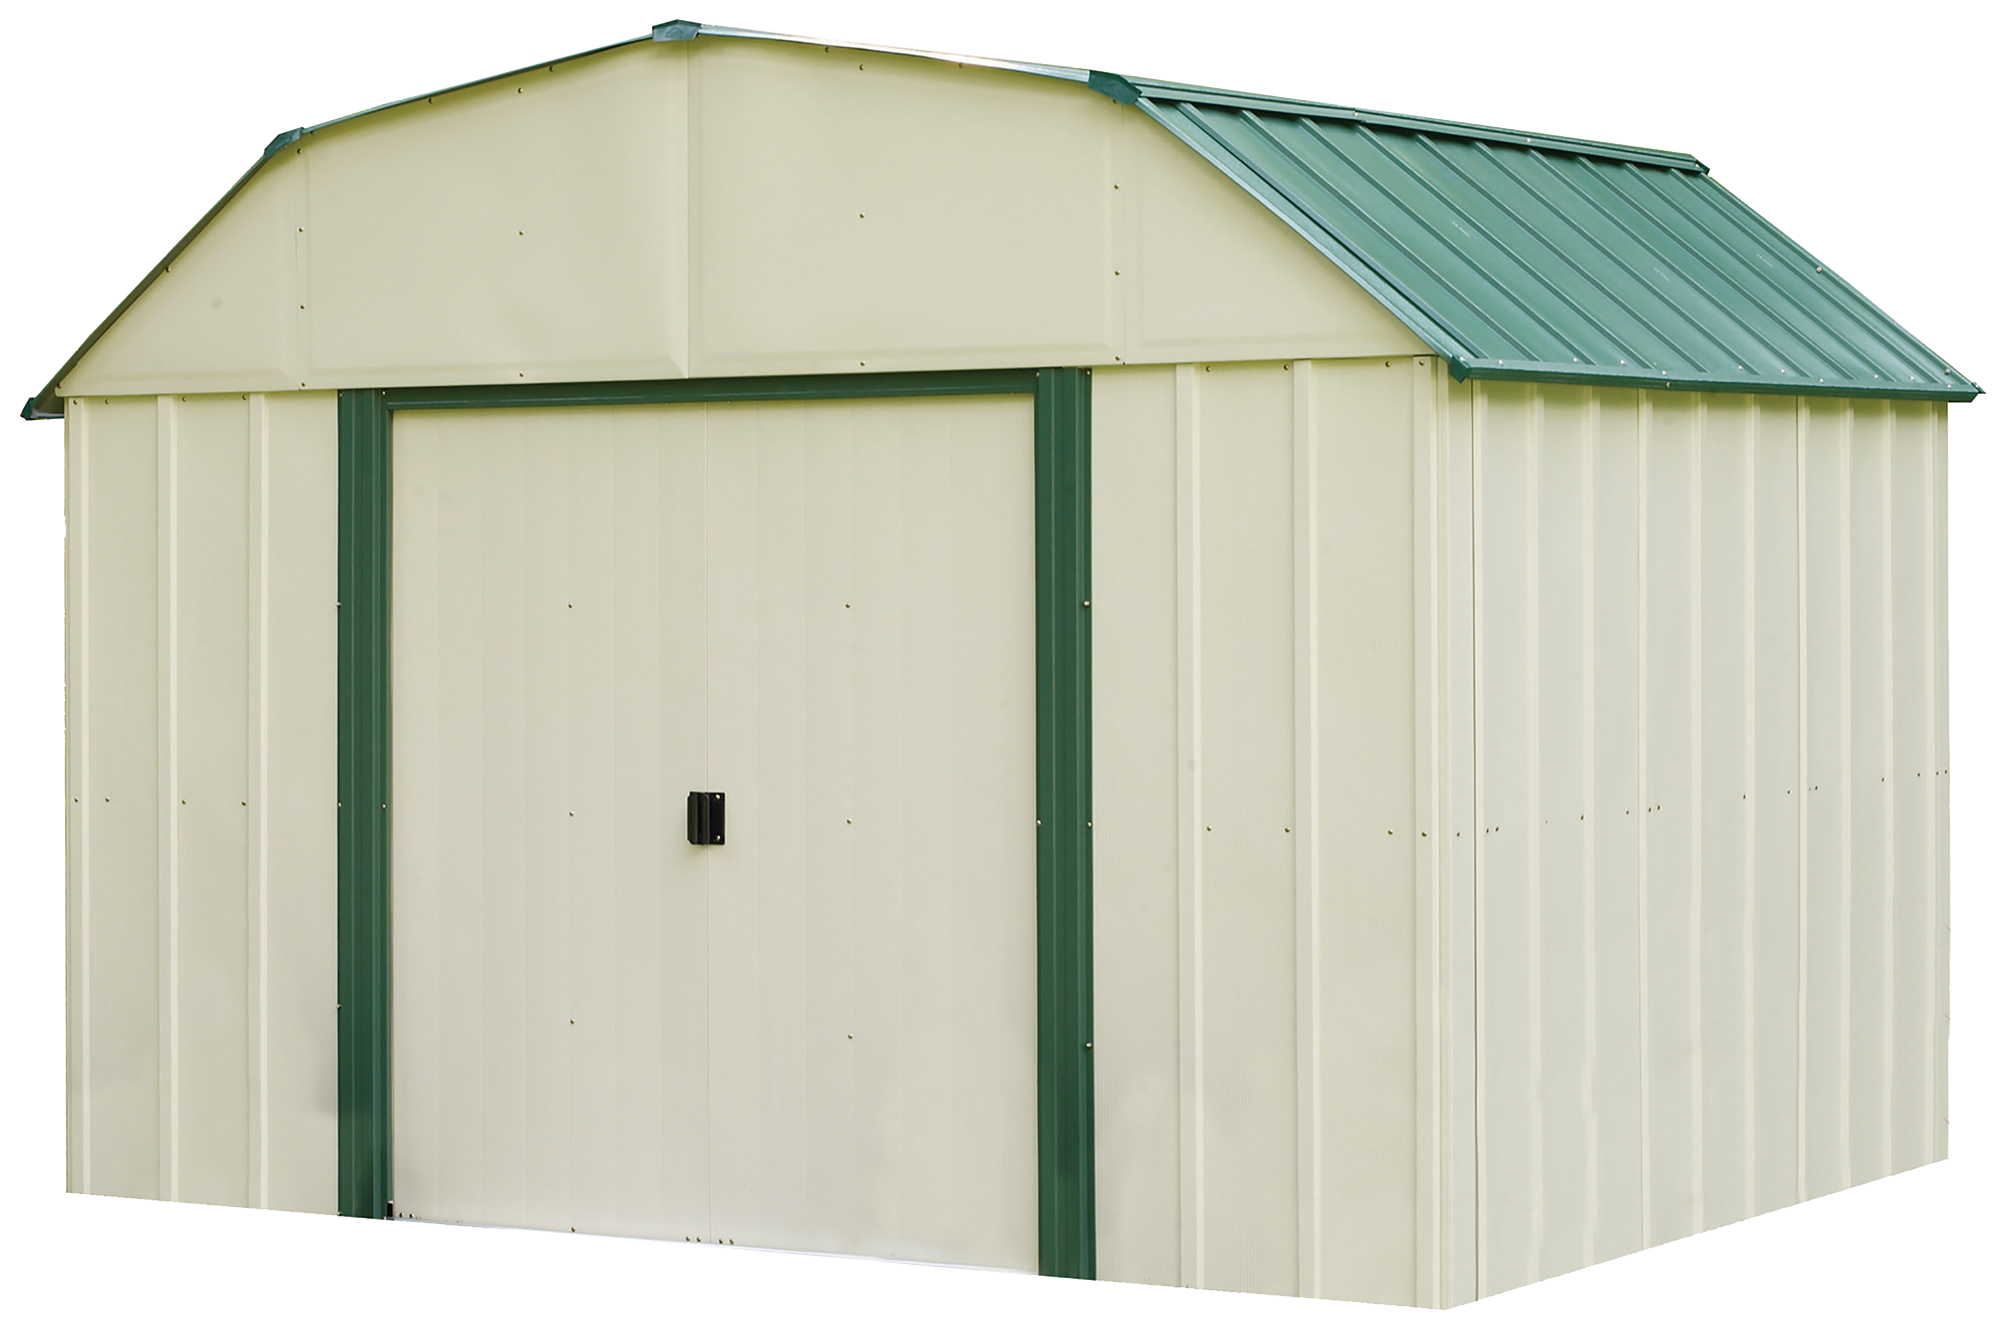 Steel Storage Shed 10 X 8 Ft Barn Style Meadow Greelmond